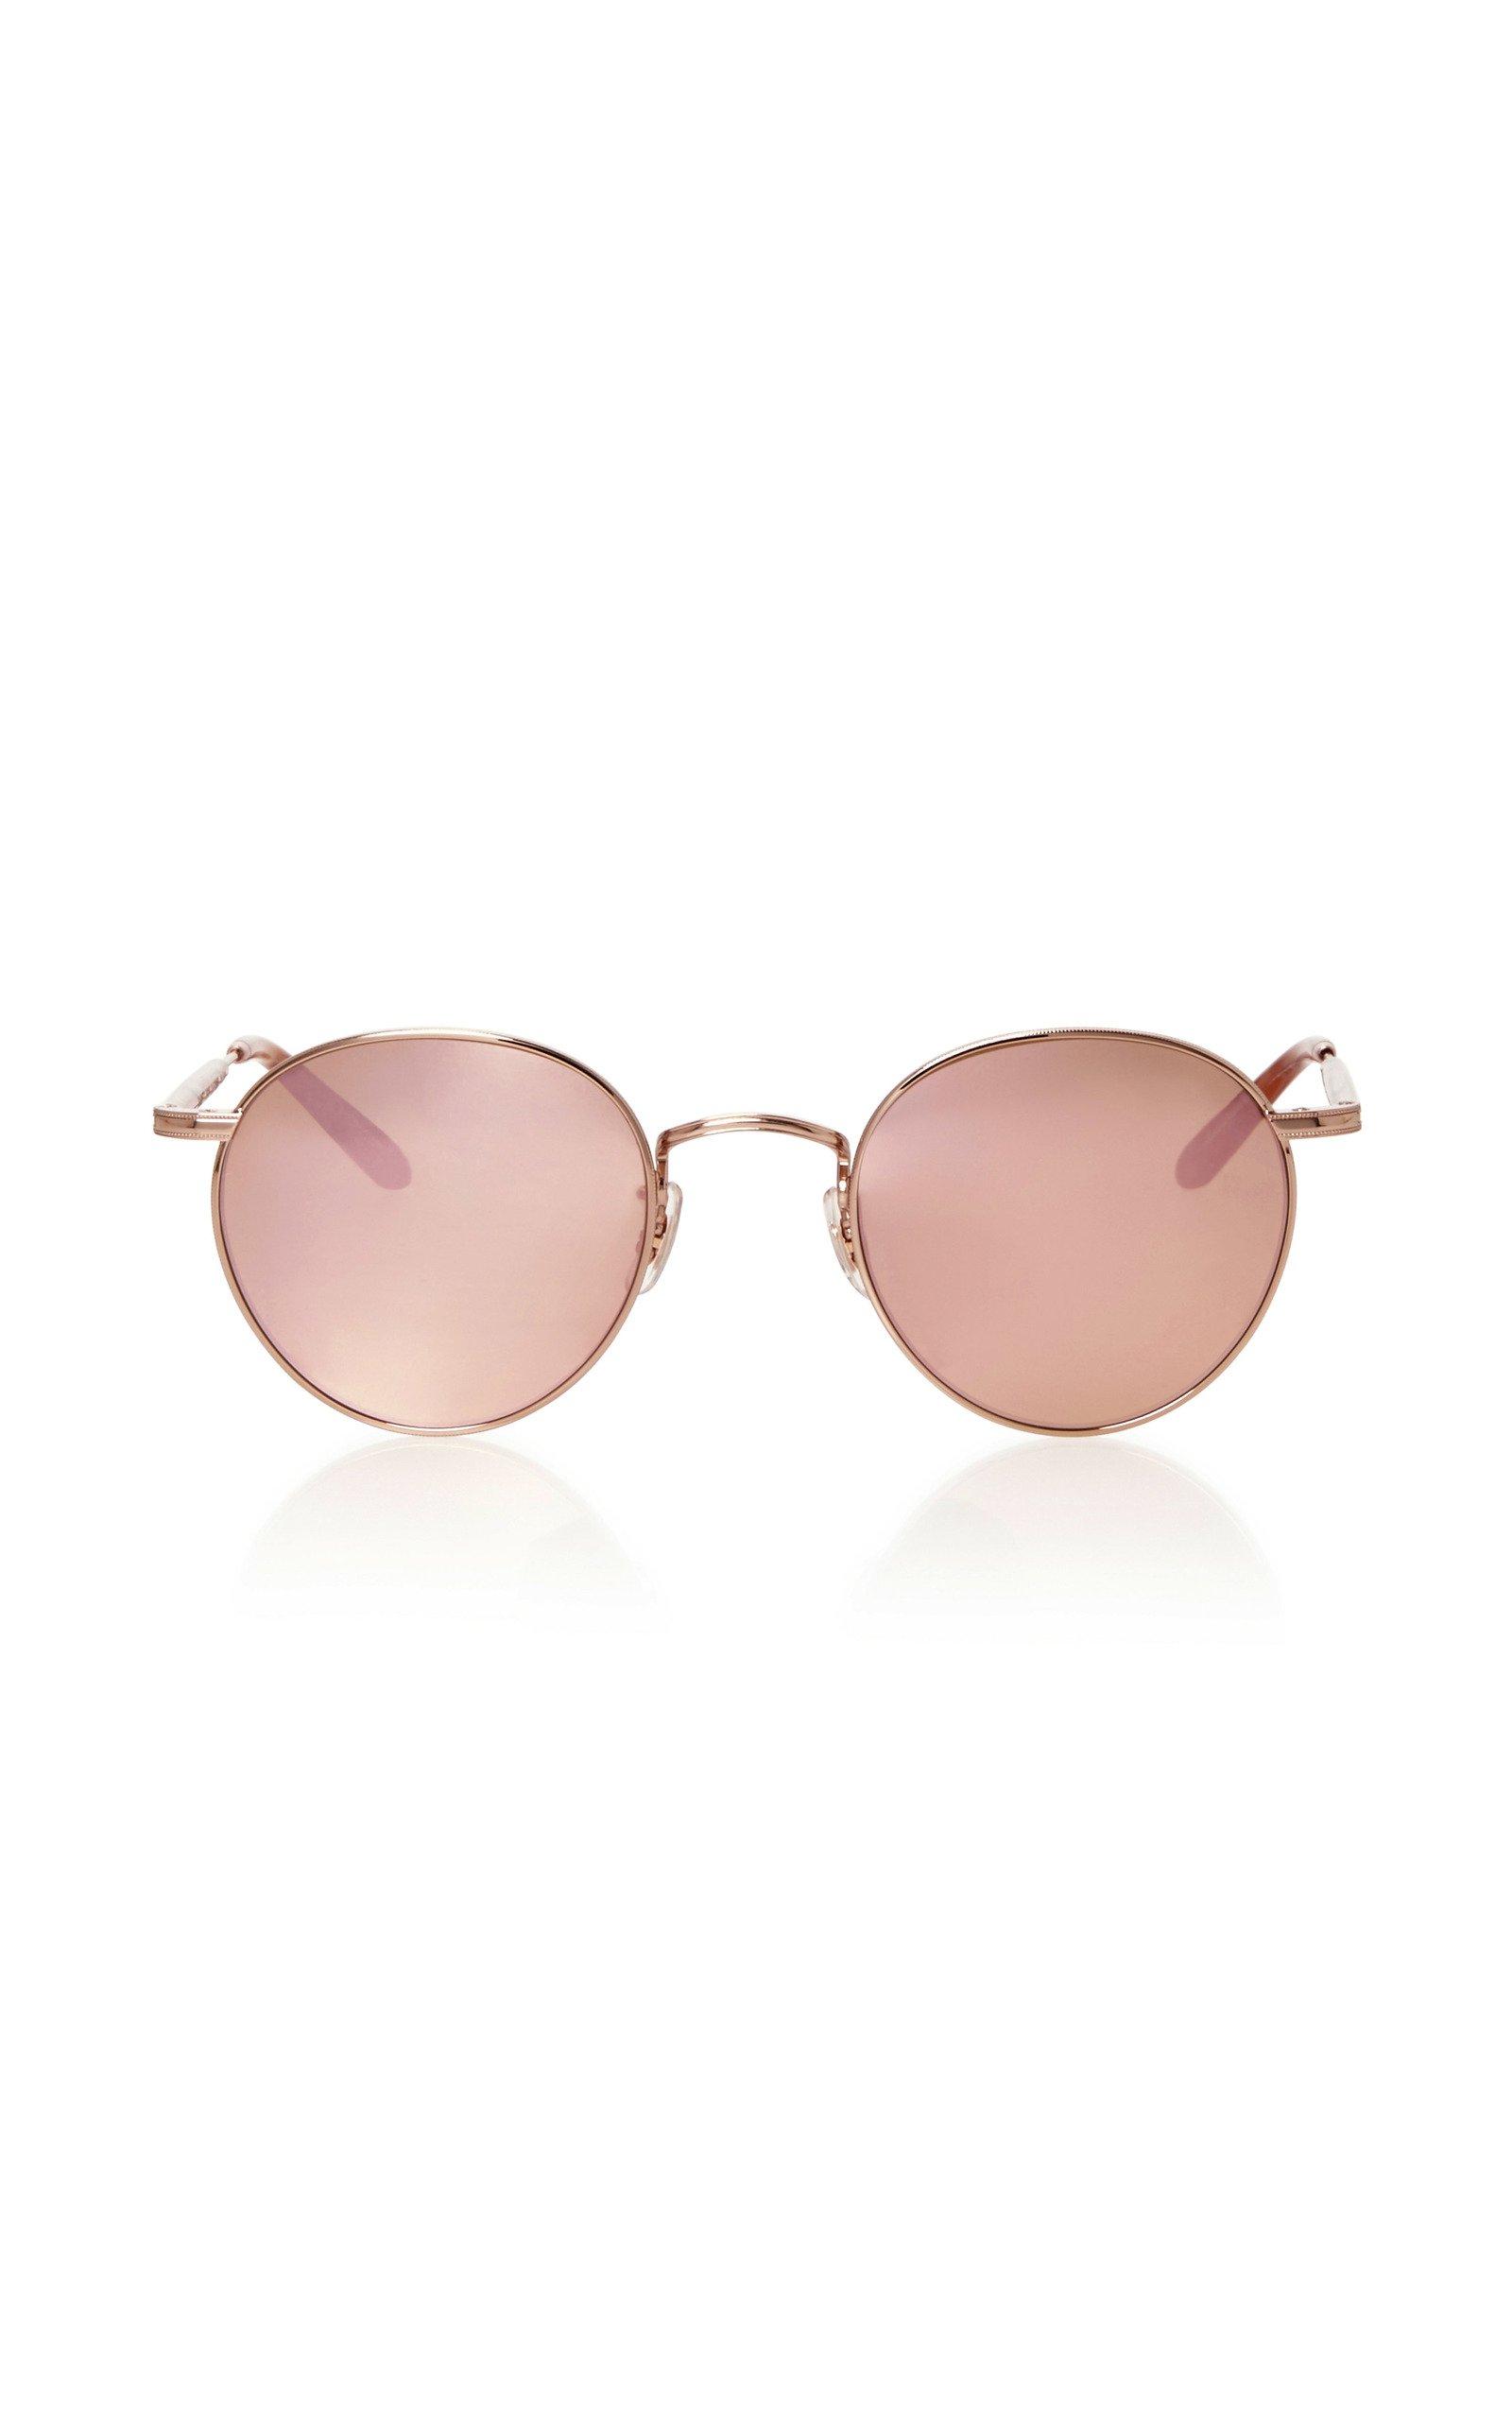 Garrett Leight Wilson M Round-Frame Sunglasses